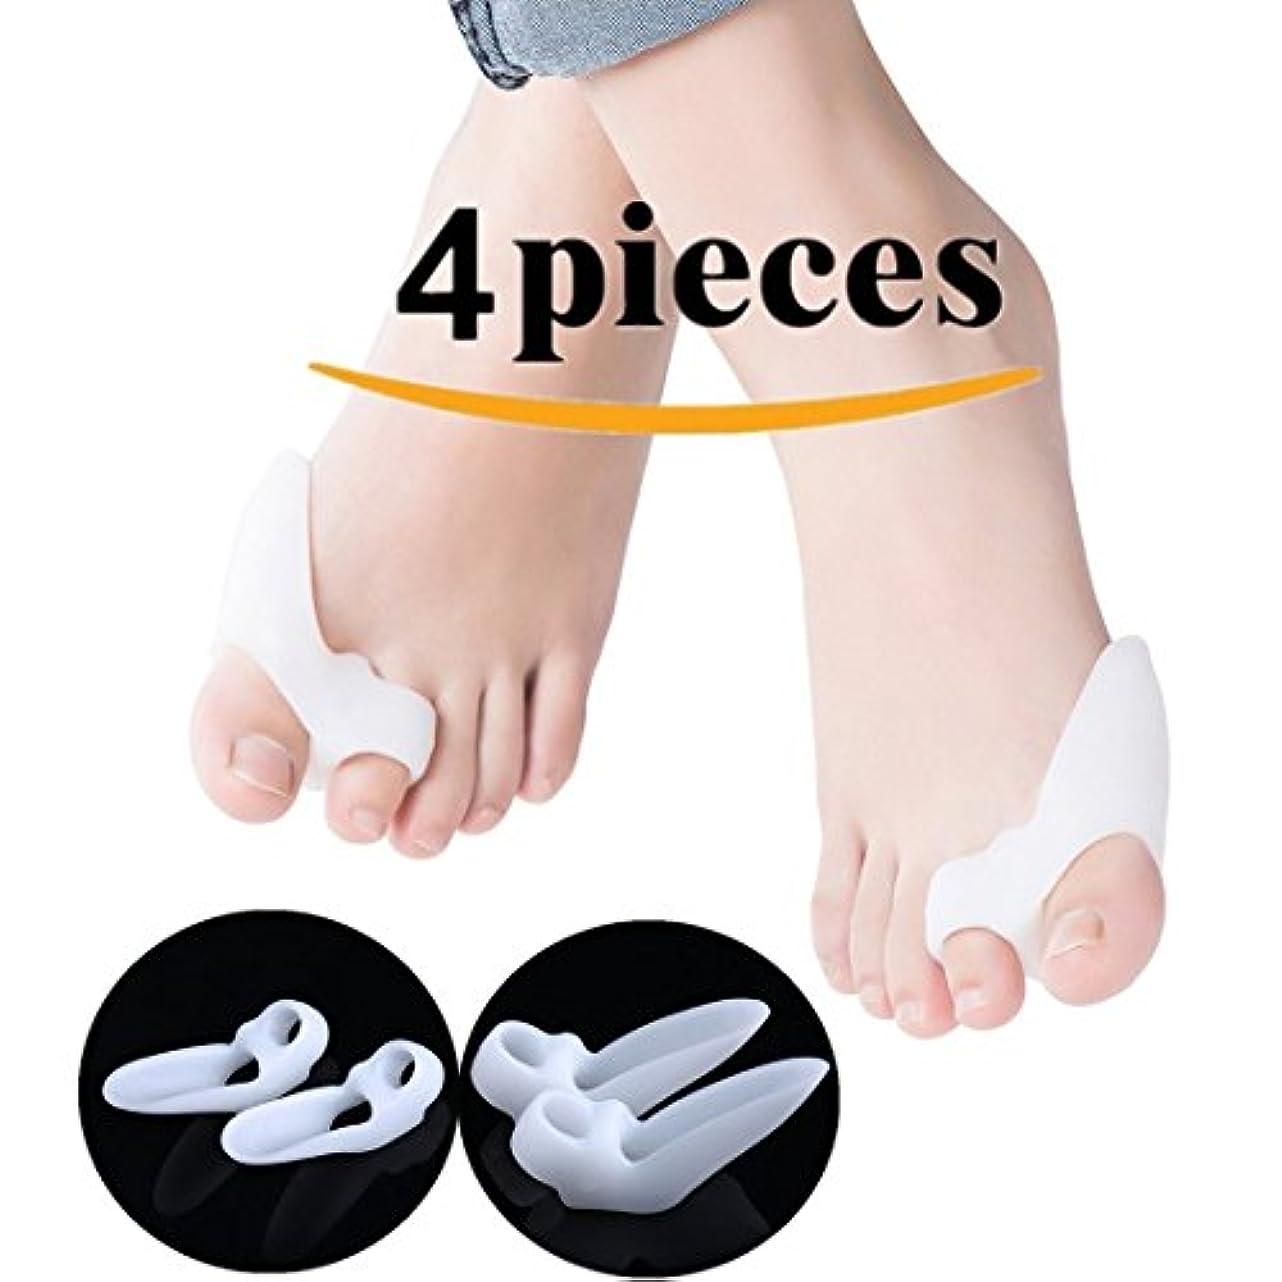 Kalevel 4個入り 二本指通す外反母趾 サポーター 足指矯正パッド 穴無しと穴付き二つタイプ足の指を広げるグッズ 痛み和らげ 足指セパレーター 指間パッド 魚の目 たこ 足底筋膜炎対策 男女兼用